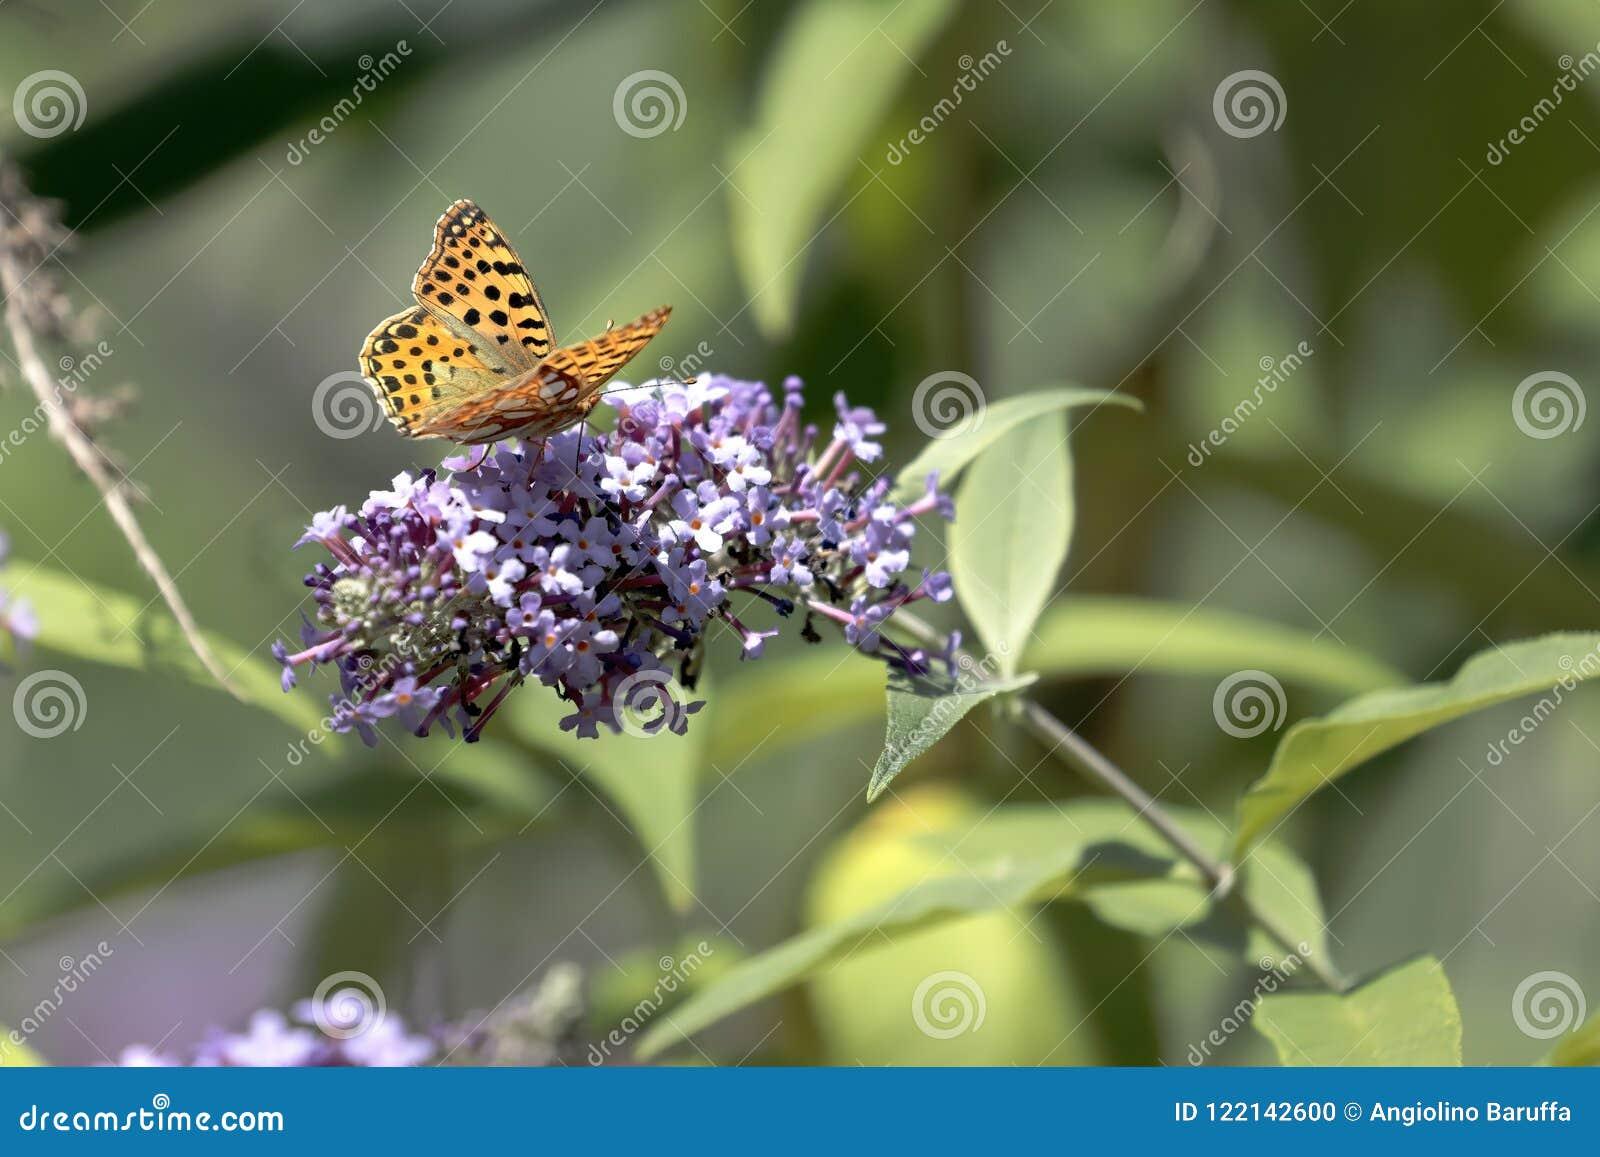 Le papillon Siproeta de malachite stelenessucking le nectar du